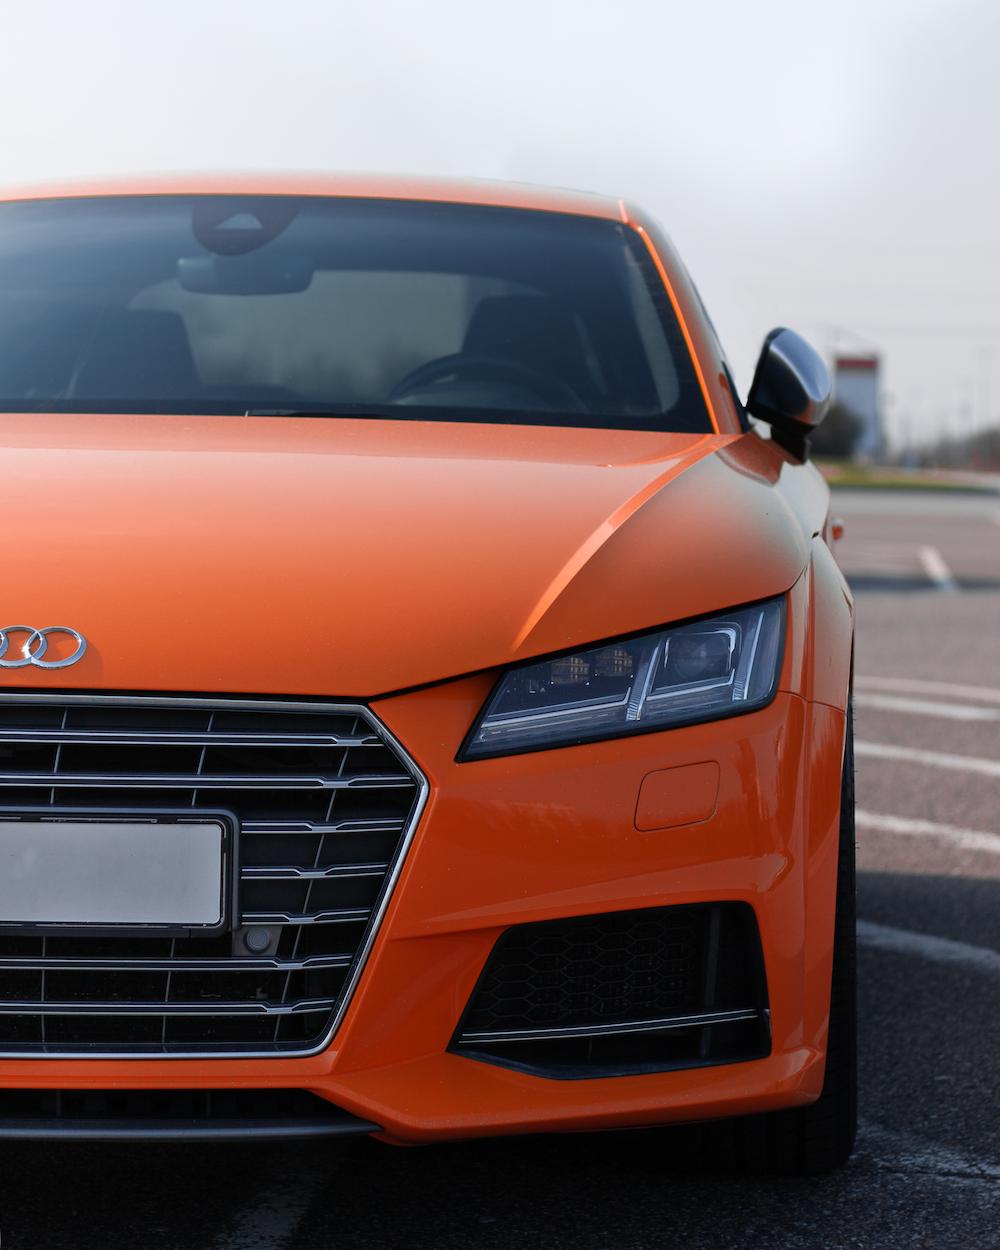 orange Audi vehicle